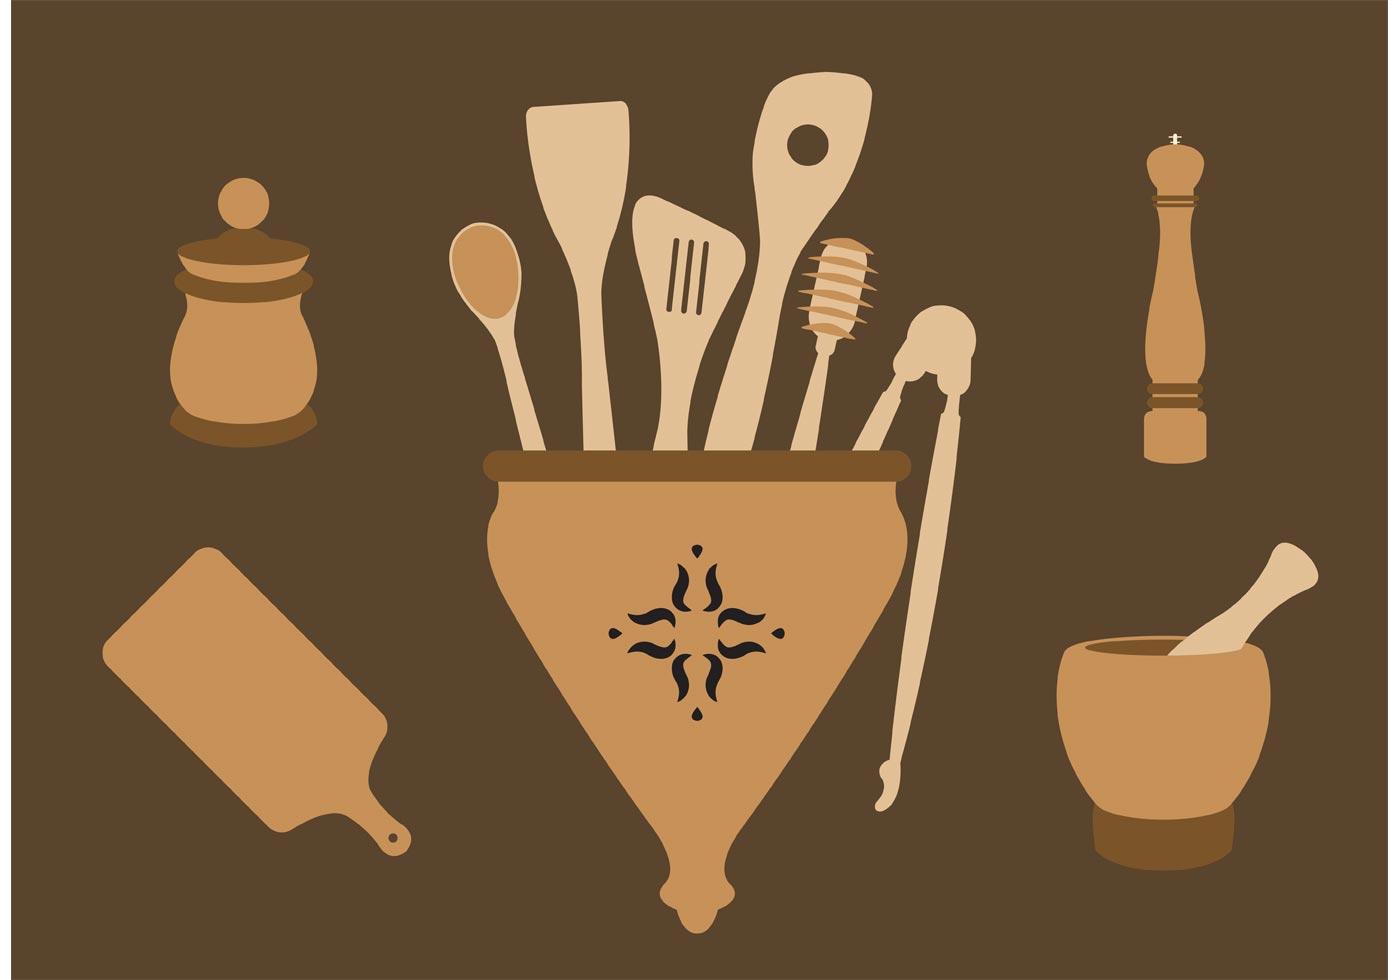 Classic Wooden Spoons Download Free Vector Art Stock